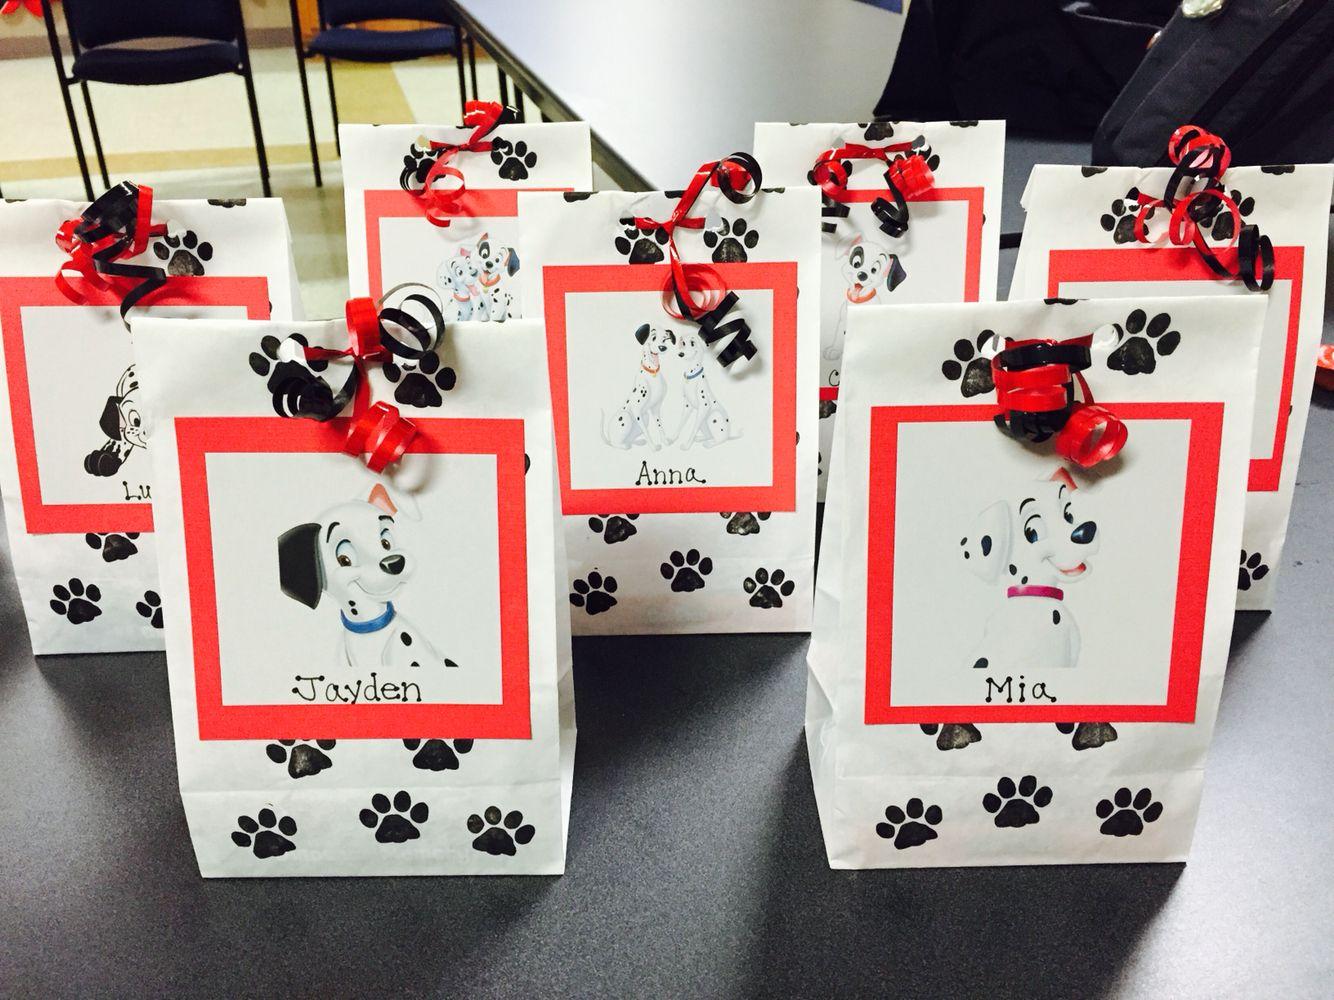 101 Dalmatians Birthday Party Treat Bags Birthday Party Treat Bags Birthday Party Treats Dalmatian Party